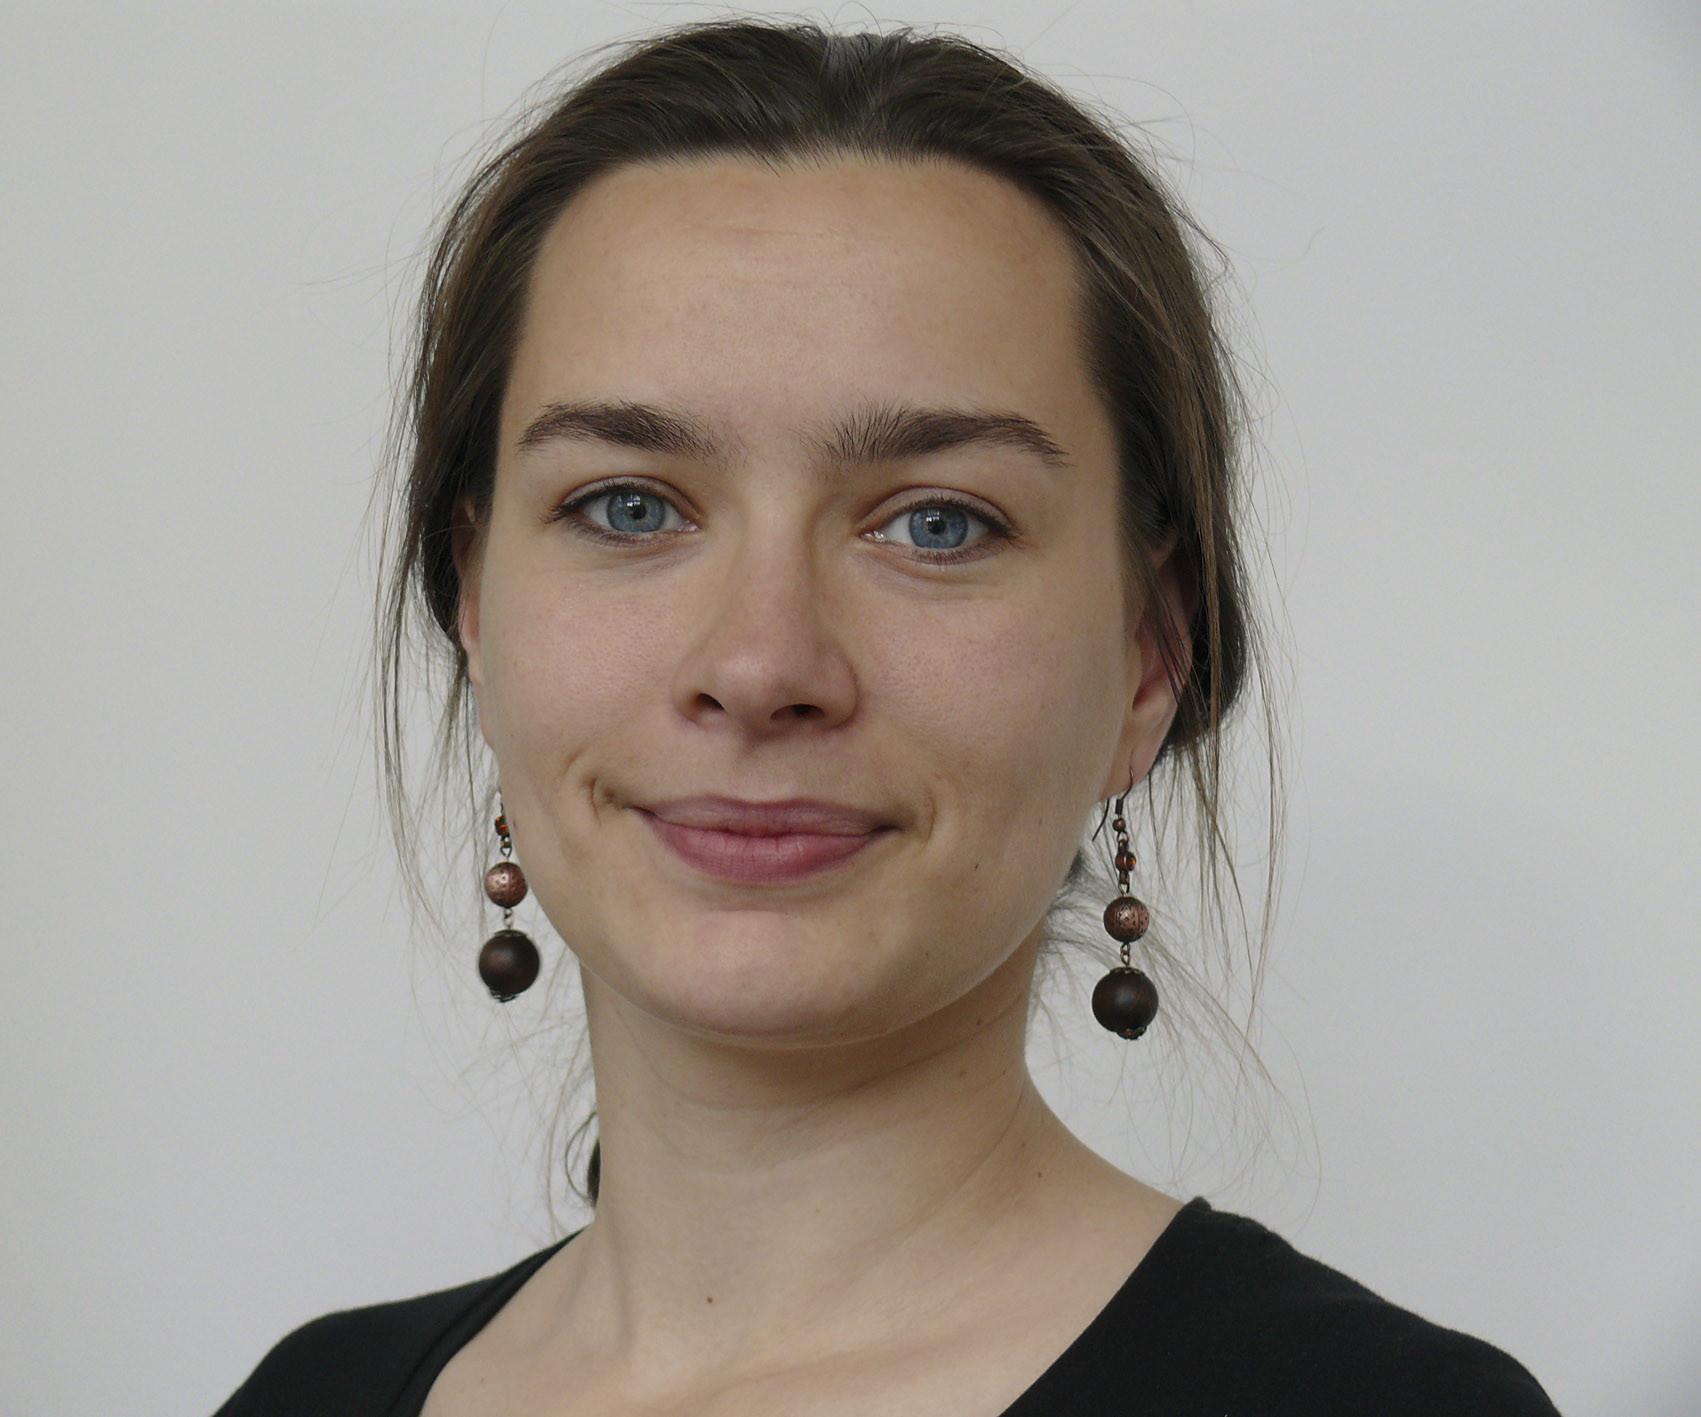 https://urbanes-lernen.obnf.de/wp-content/uploads/2020/11/Foto-Mandy-Singer-Brodowski.jpg